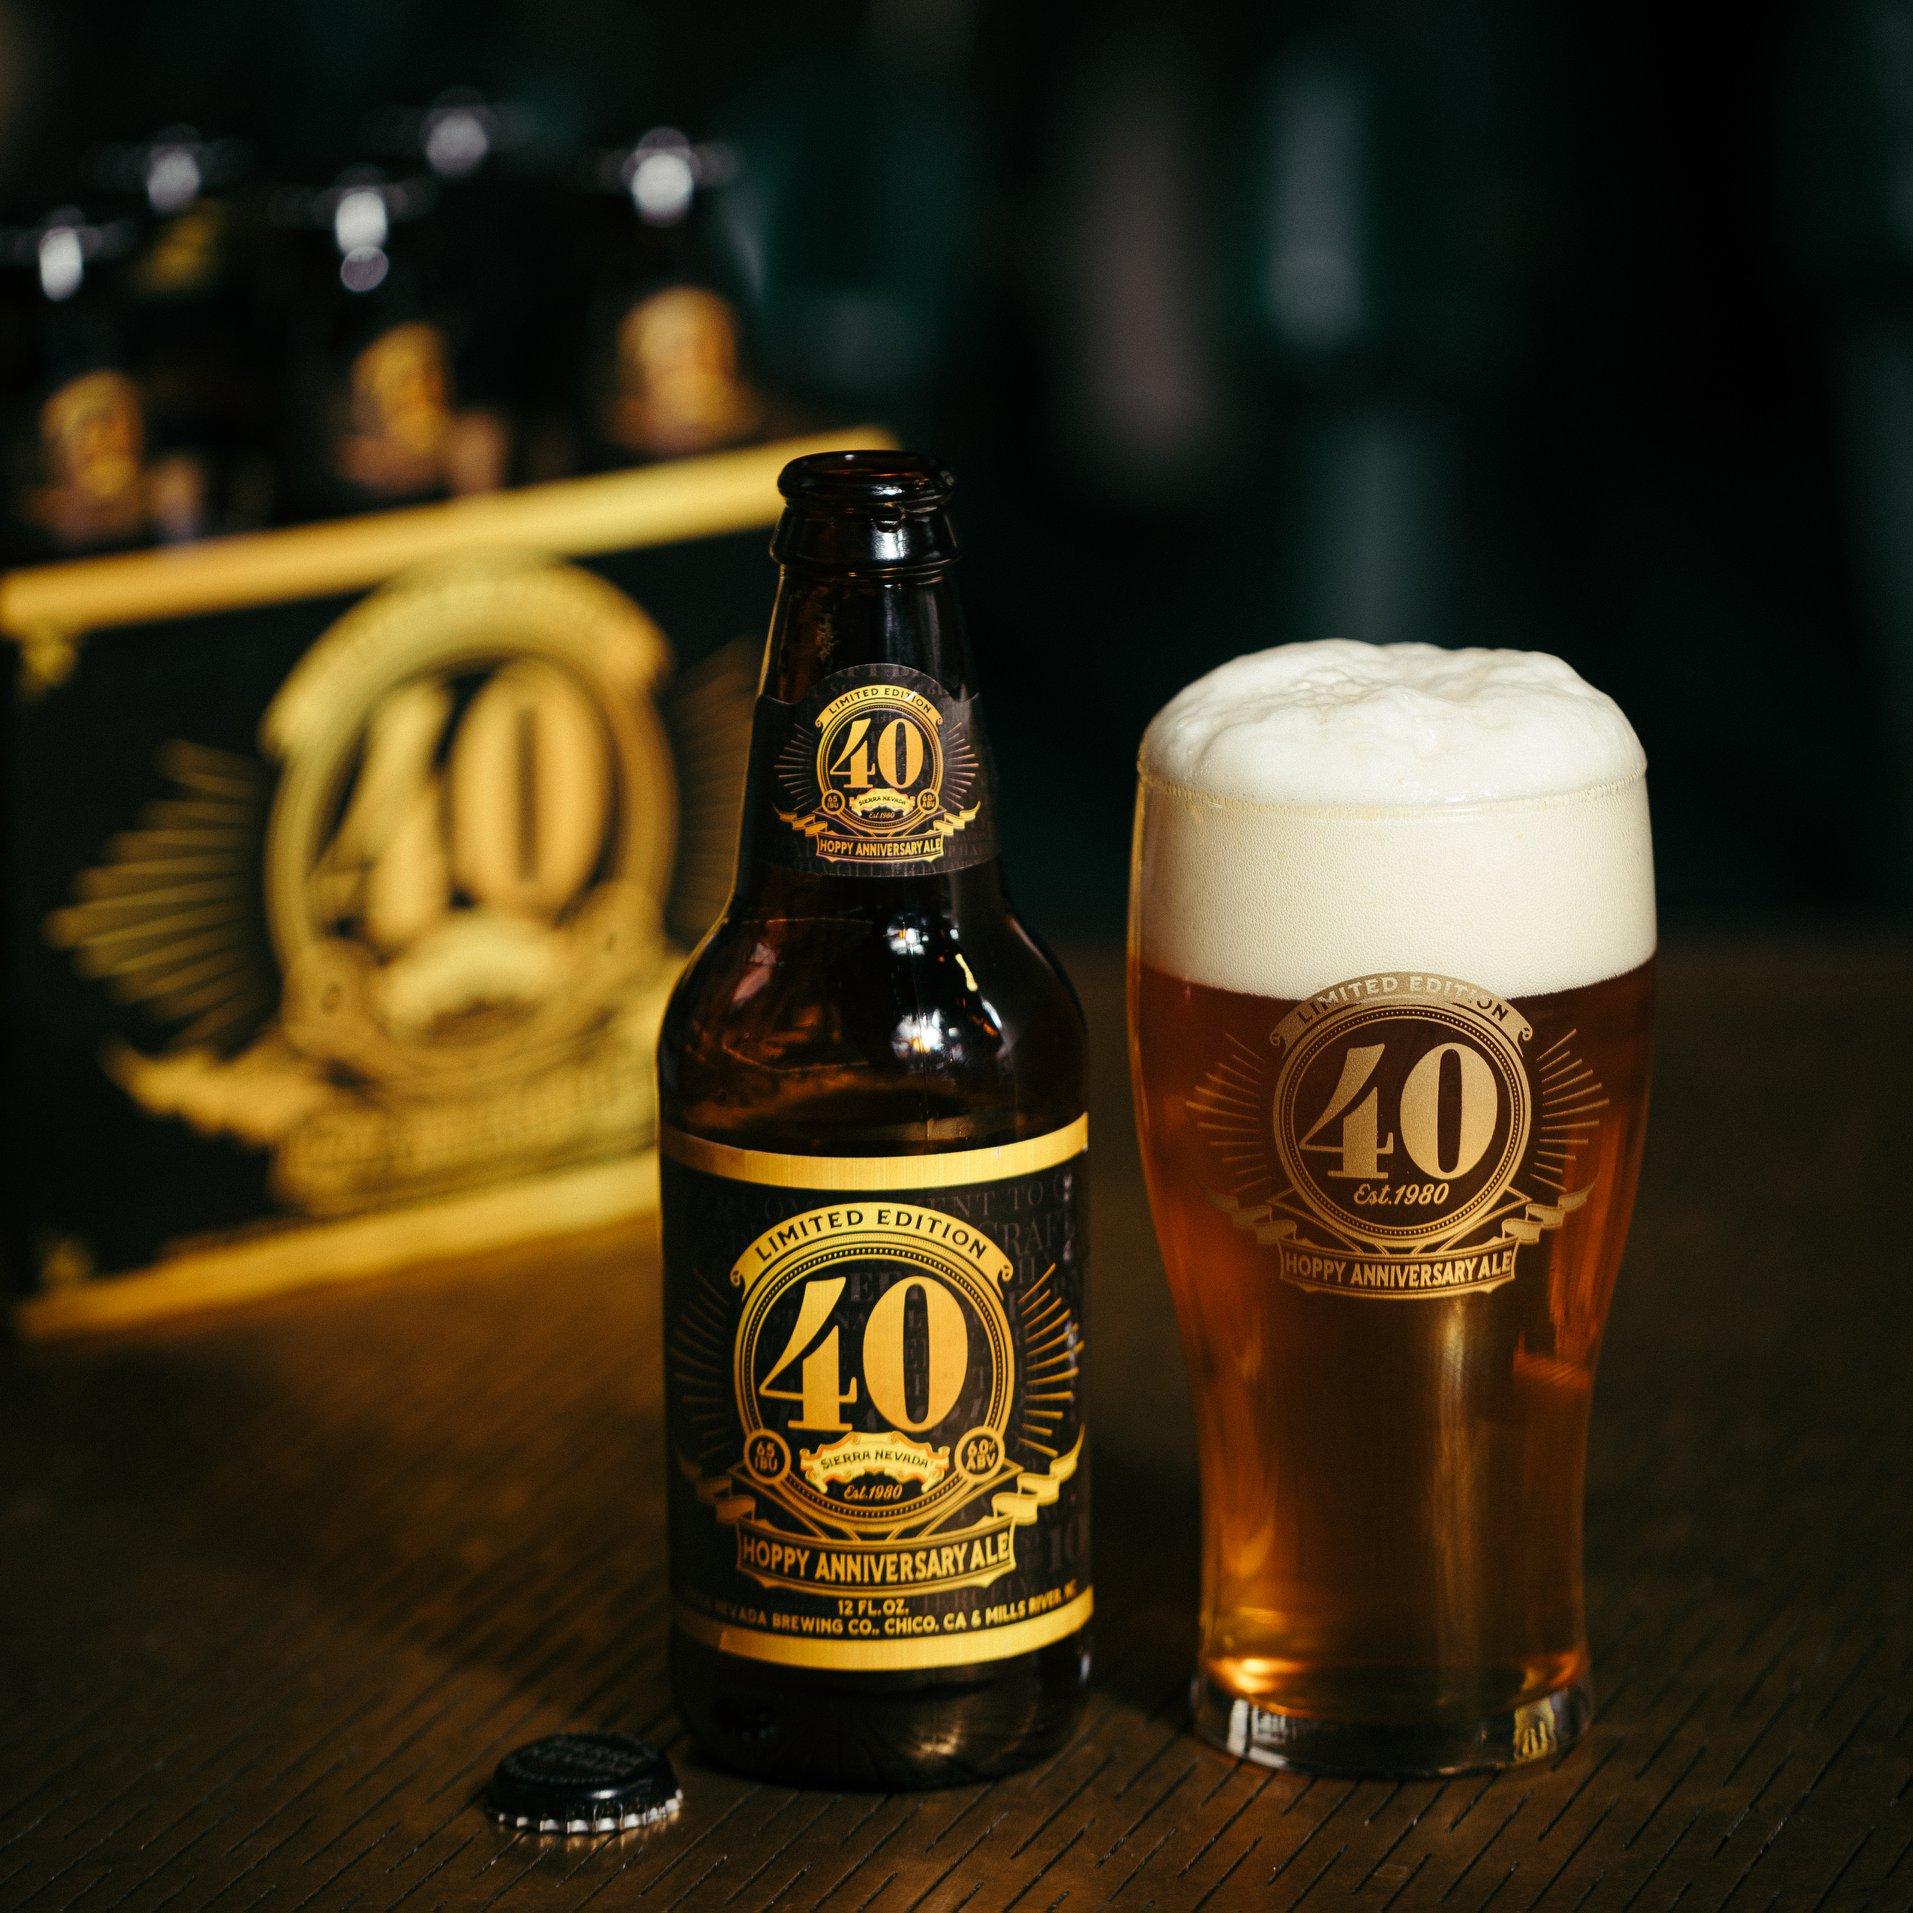 image of 40th Hoppy Anniversary Ale courtesy of Sierra Nevada Brewing